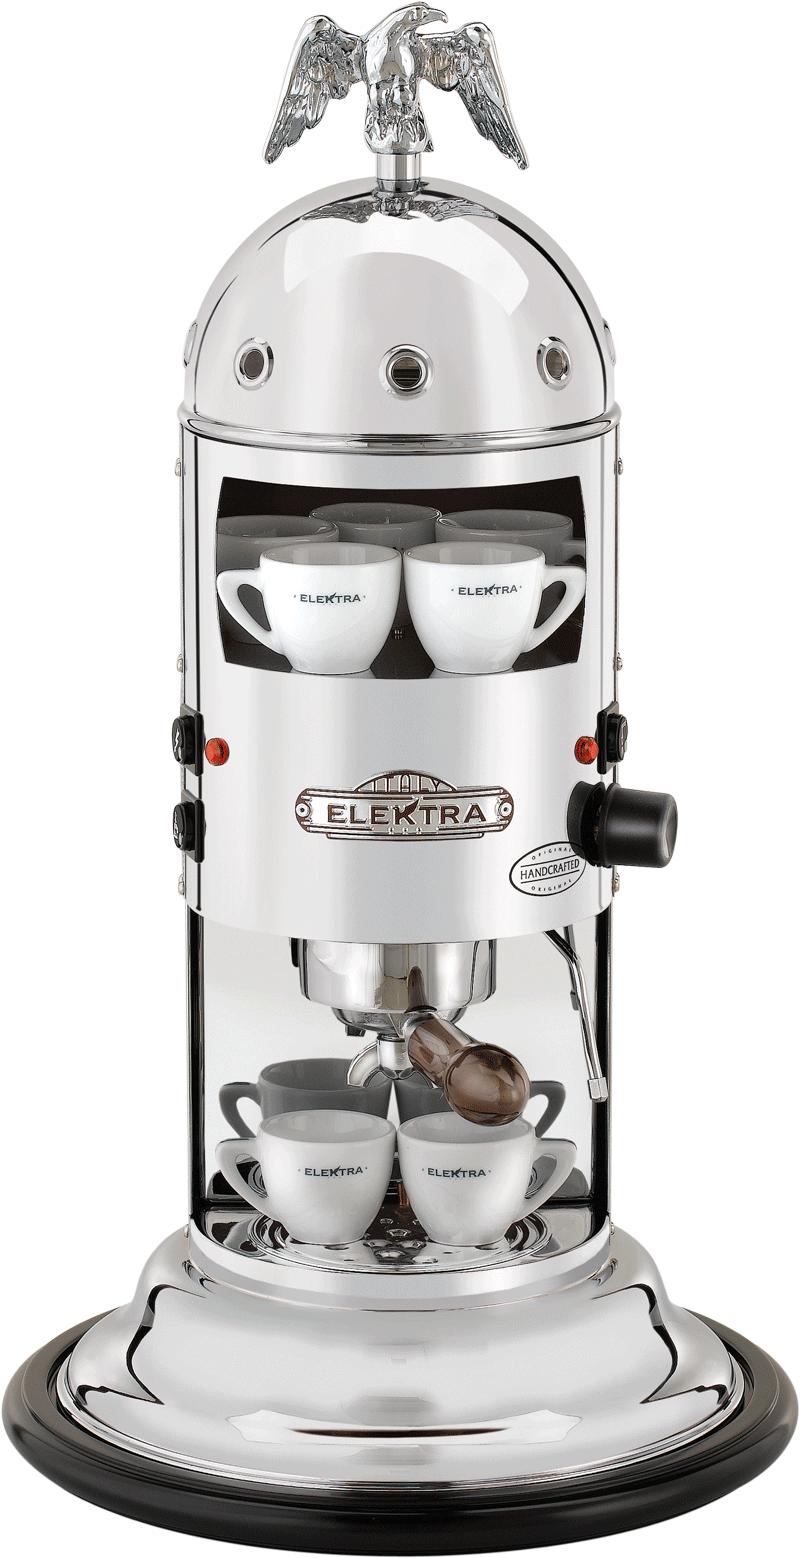 Wmf Machine Caf Full Size Of Coffee Machineswmf Coffee Machine